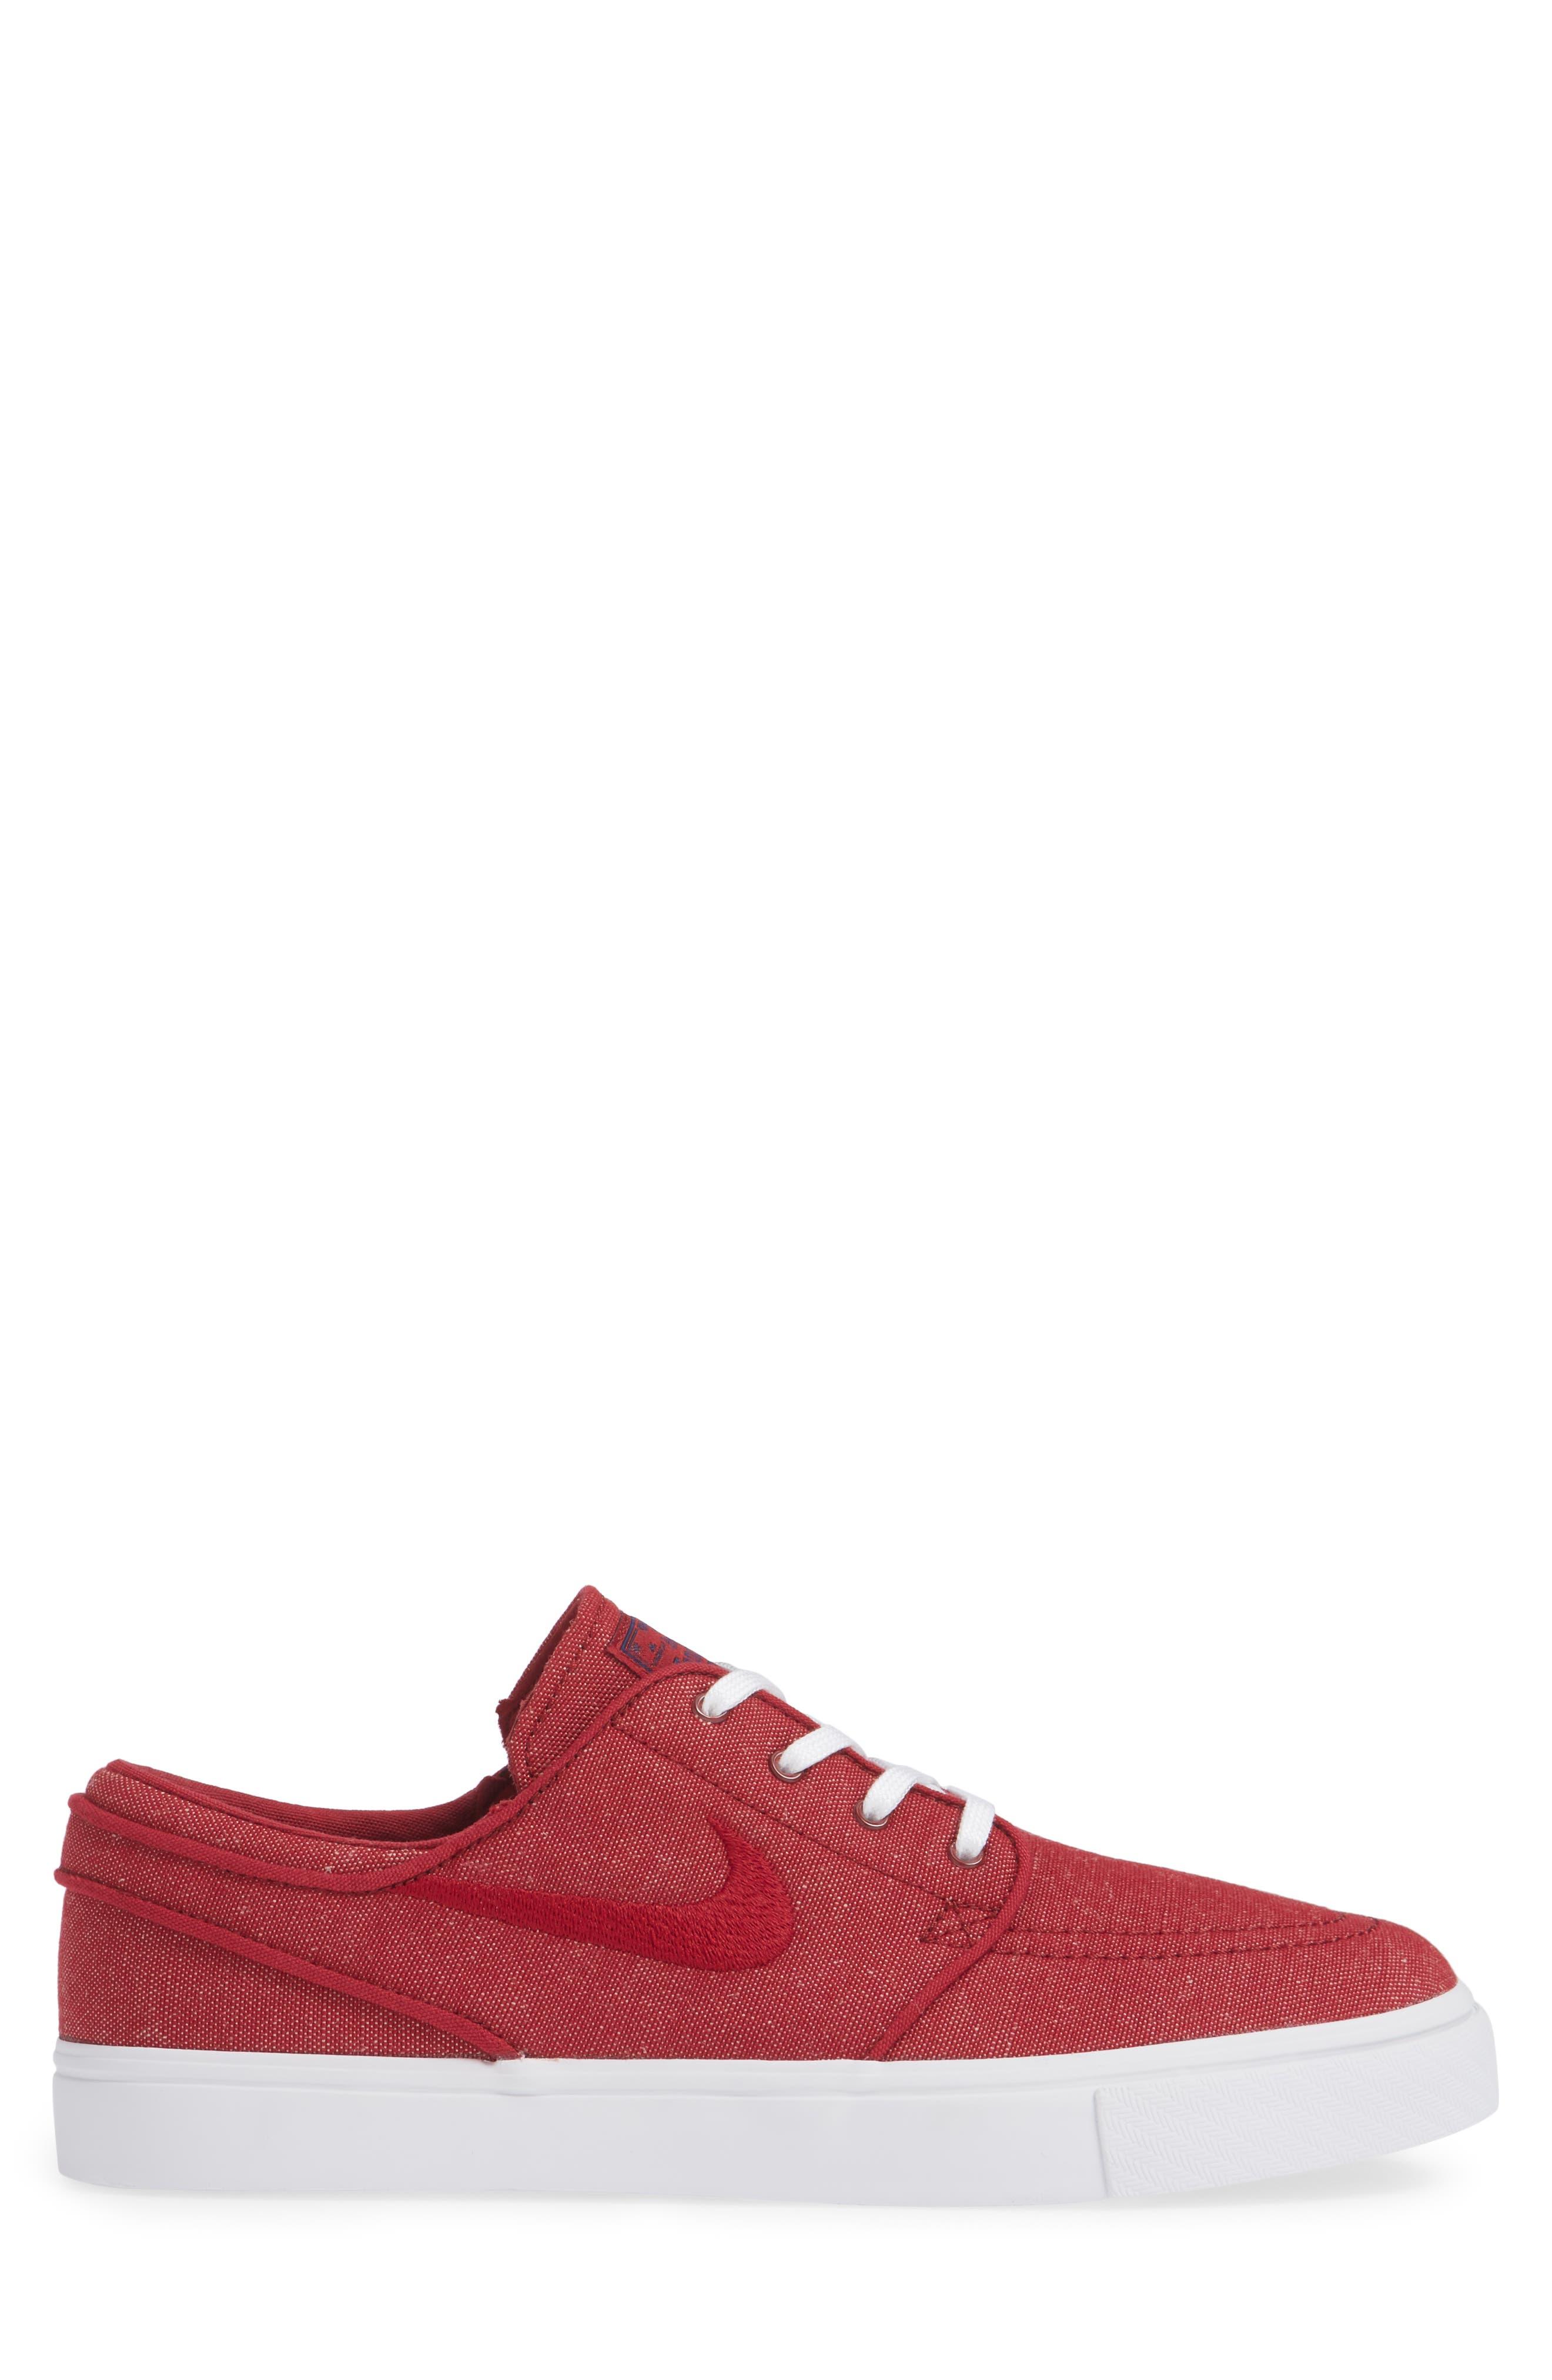 Zoom - Stefan Janoski SB Canvas Skate Shoe,                             Alternate thumbnail 5, color,                             Red Crush/ White